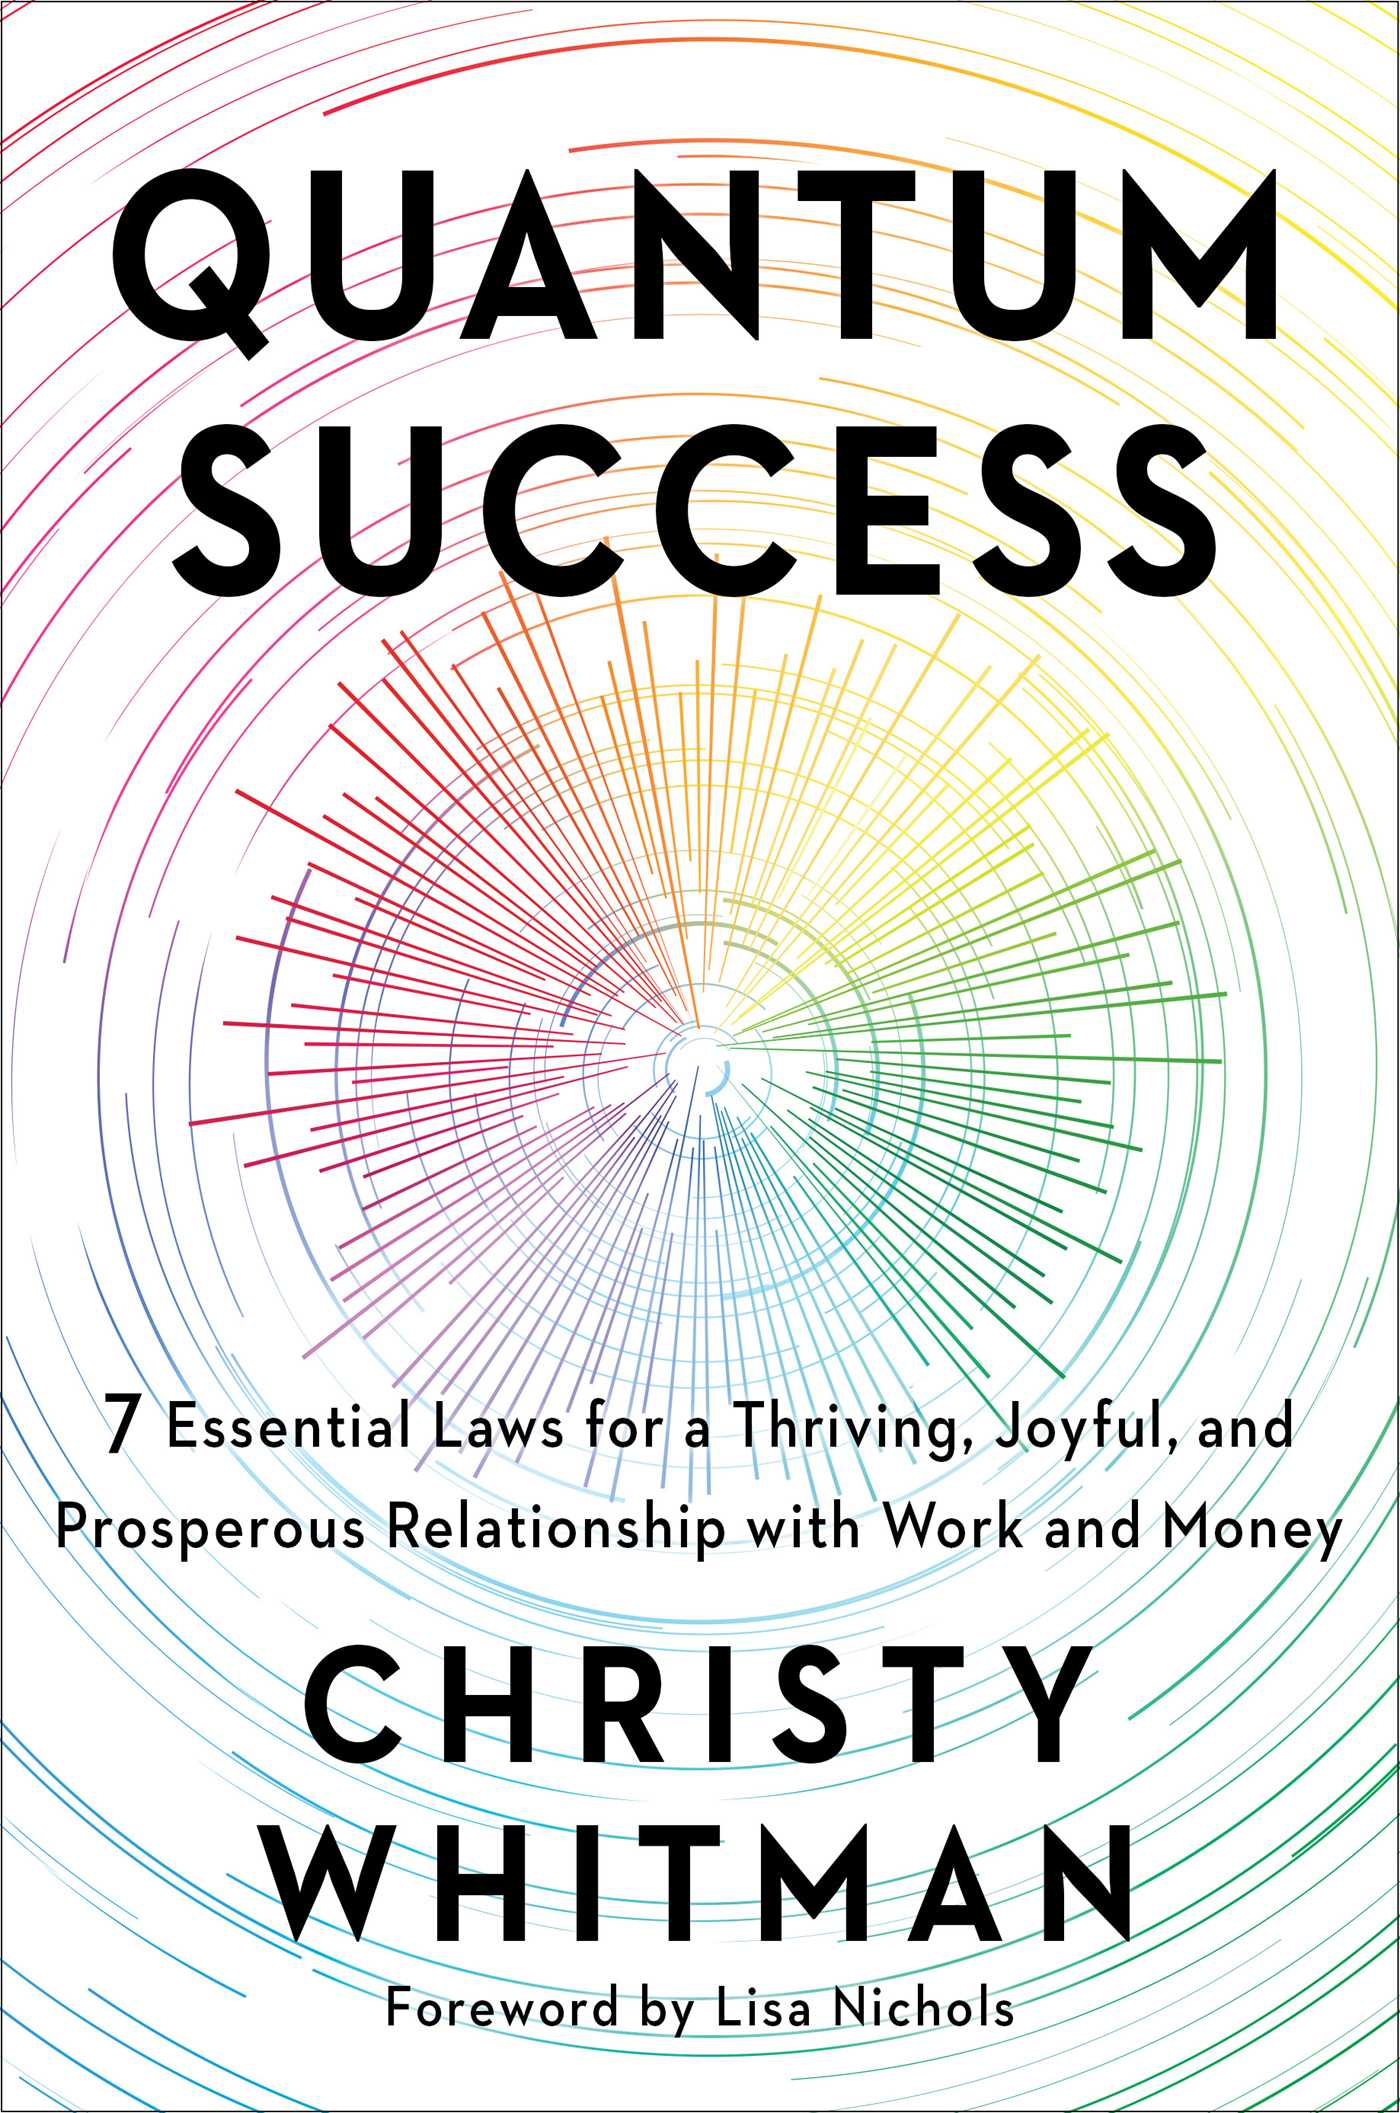 http://www.simonandschuster.com/books/Quantum-Success/Christy-Whitman/9781501179006